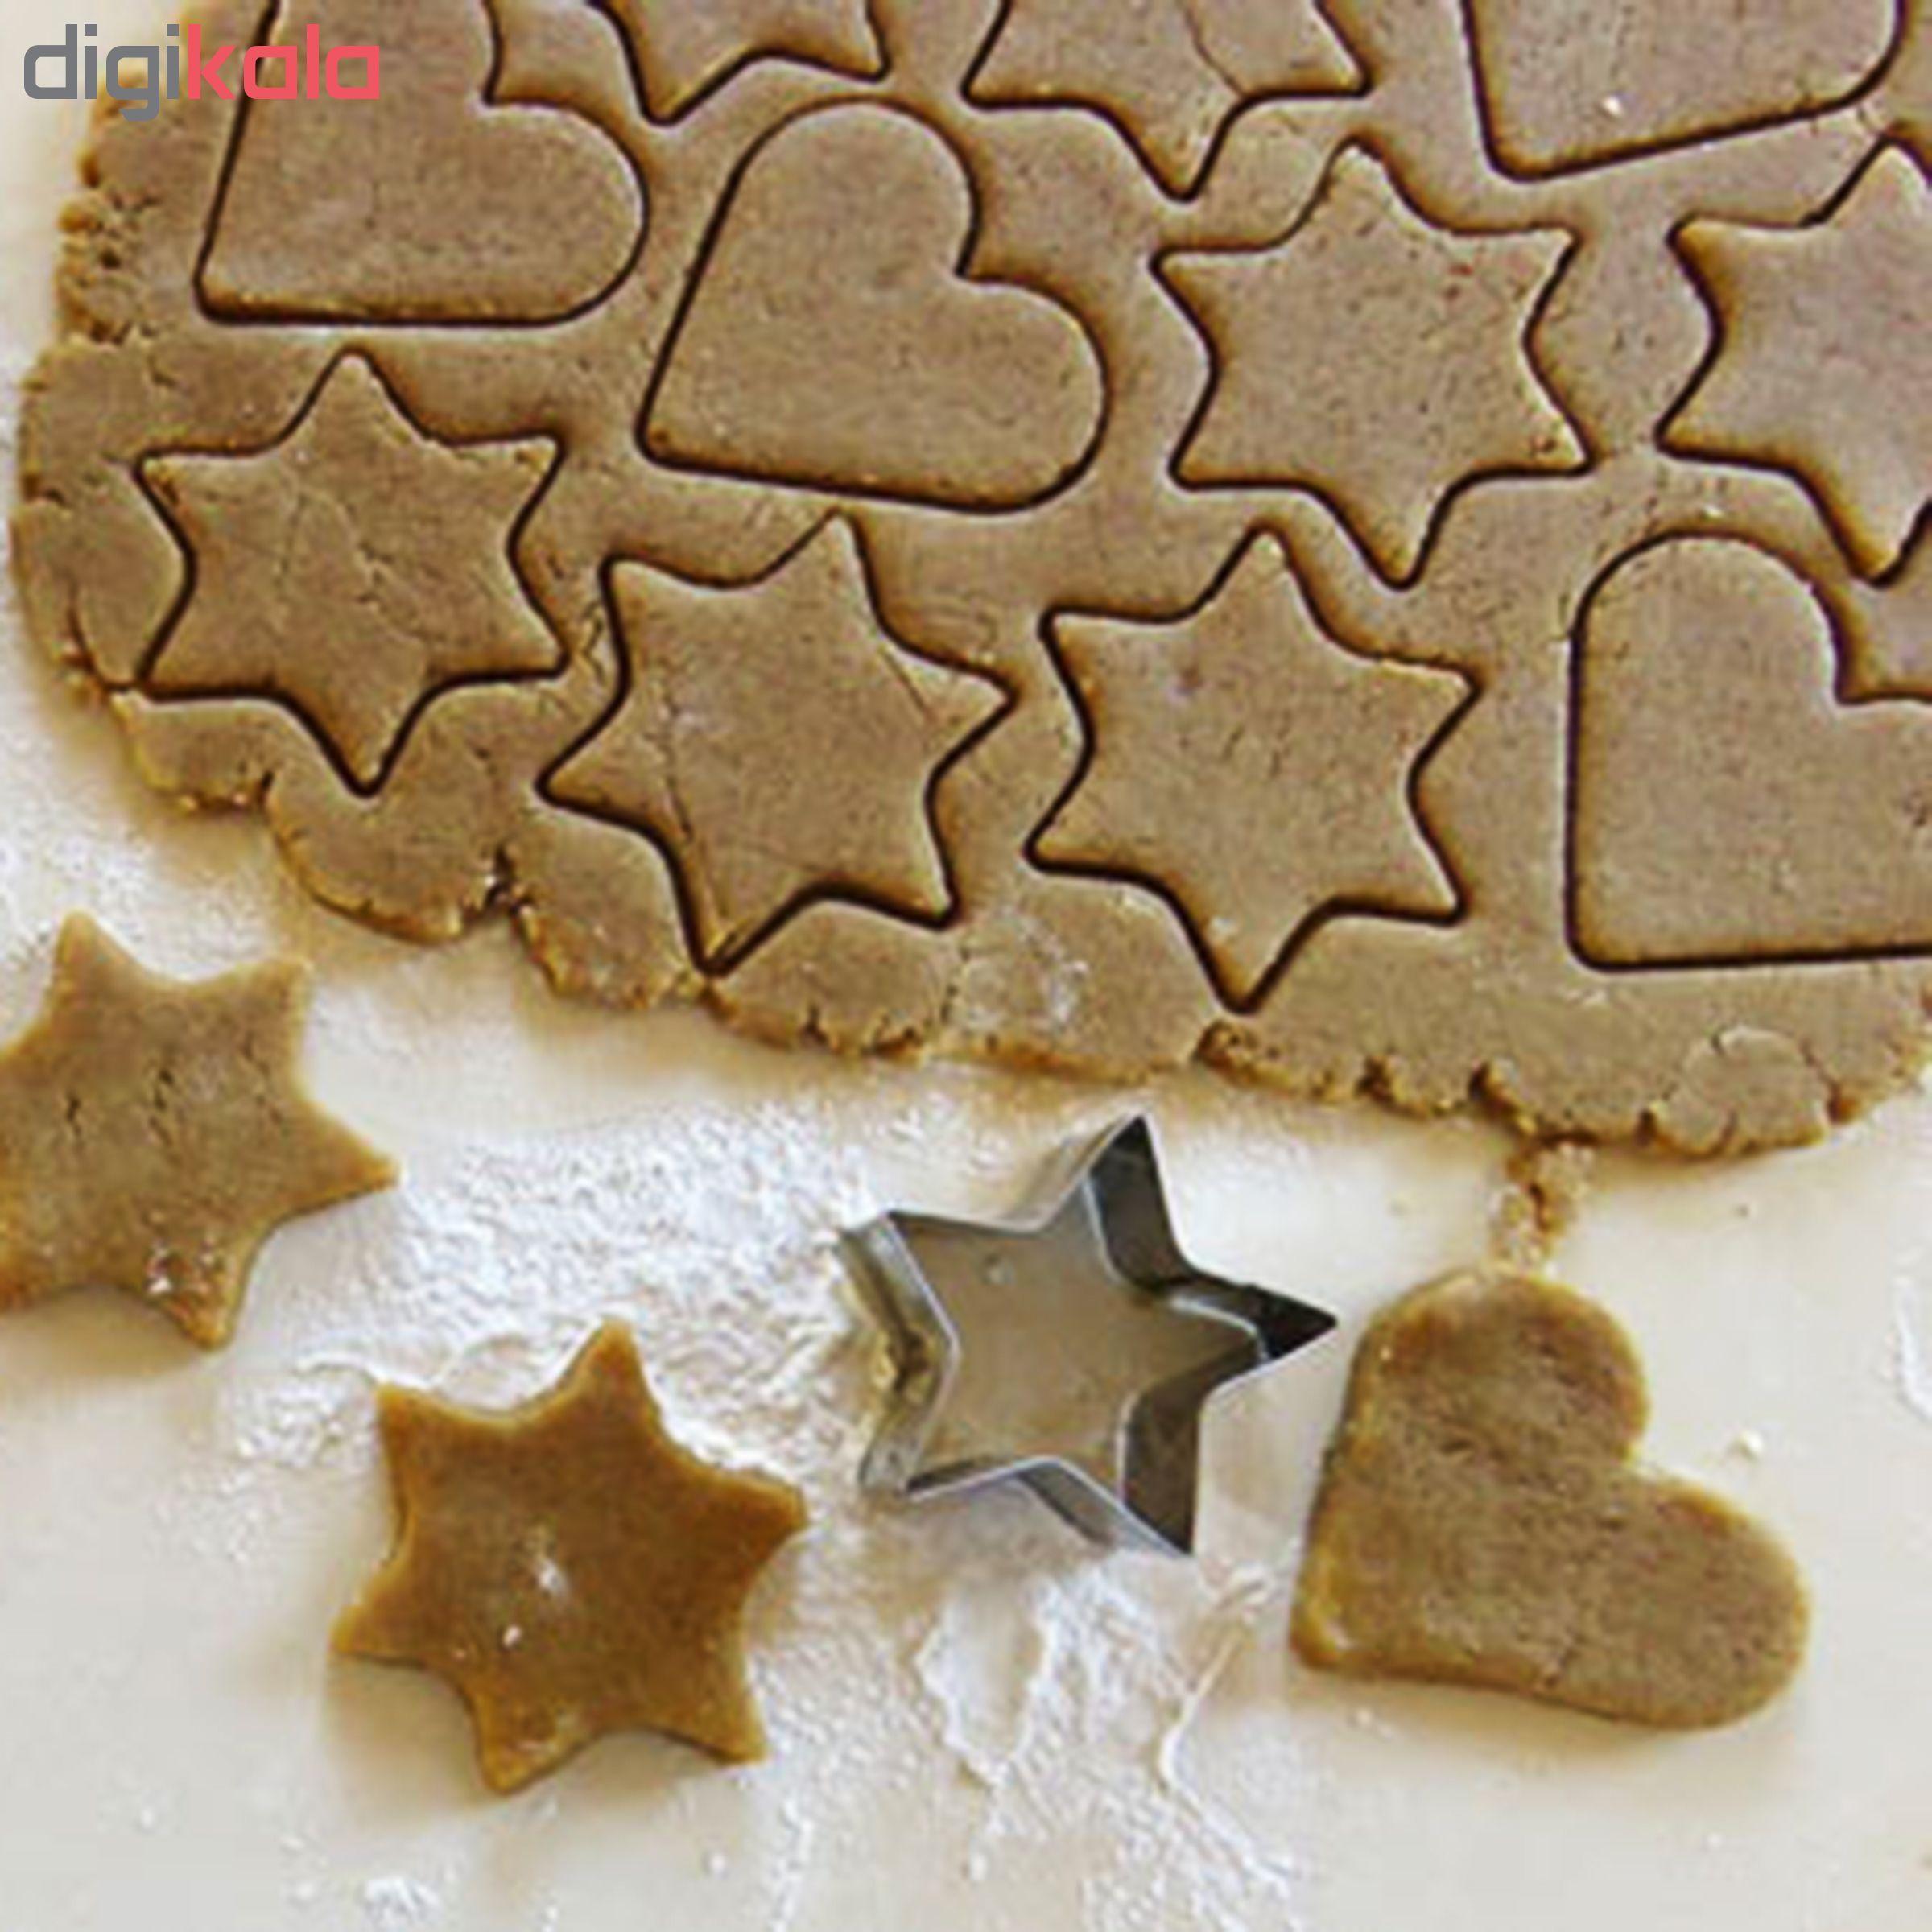 کاتر شیرینی پزی مدل Cookie Cutter بسته 12 عددی main 1 12